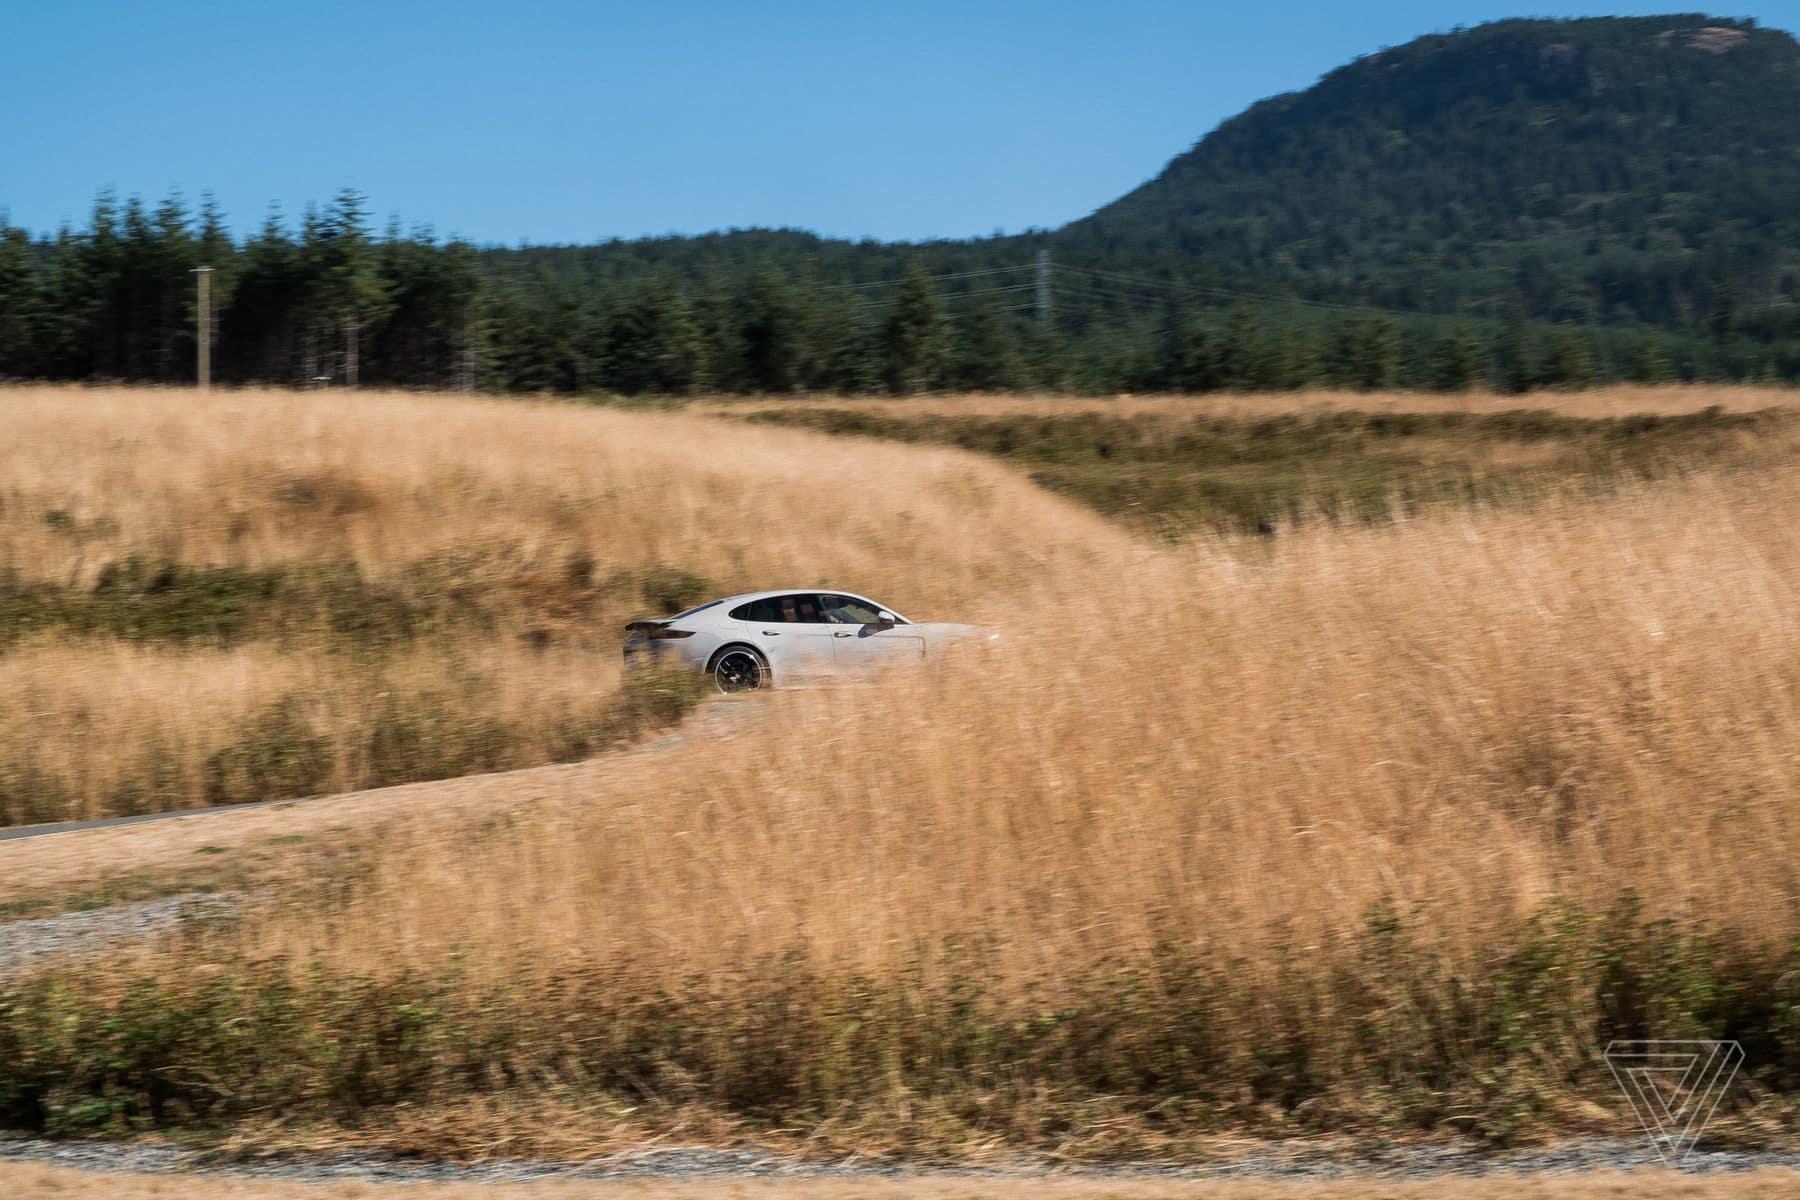 Turbo S E-Hybrid